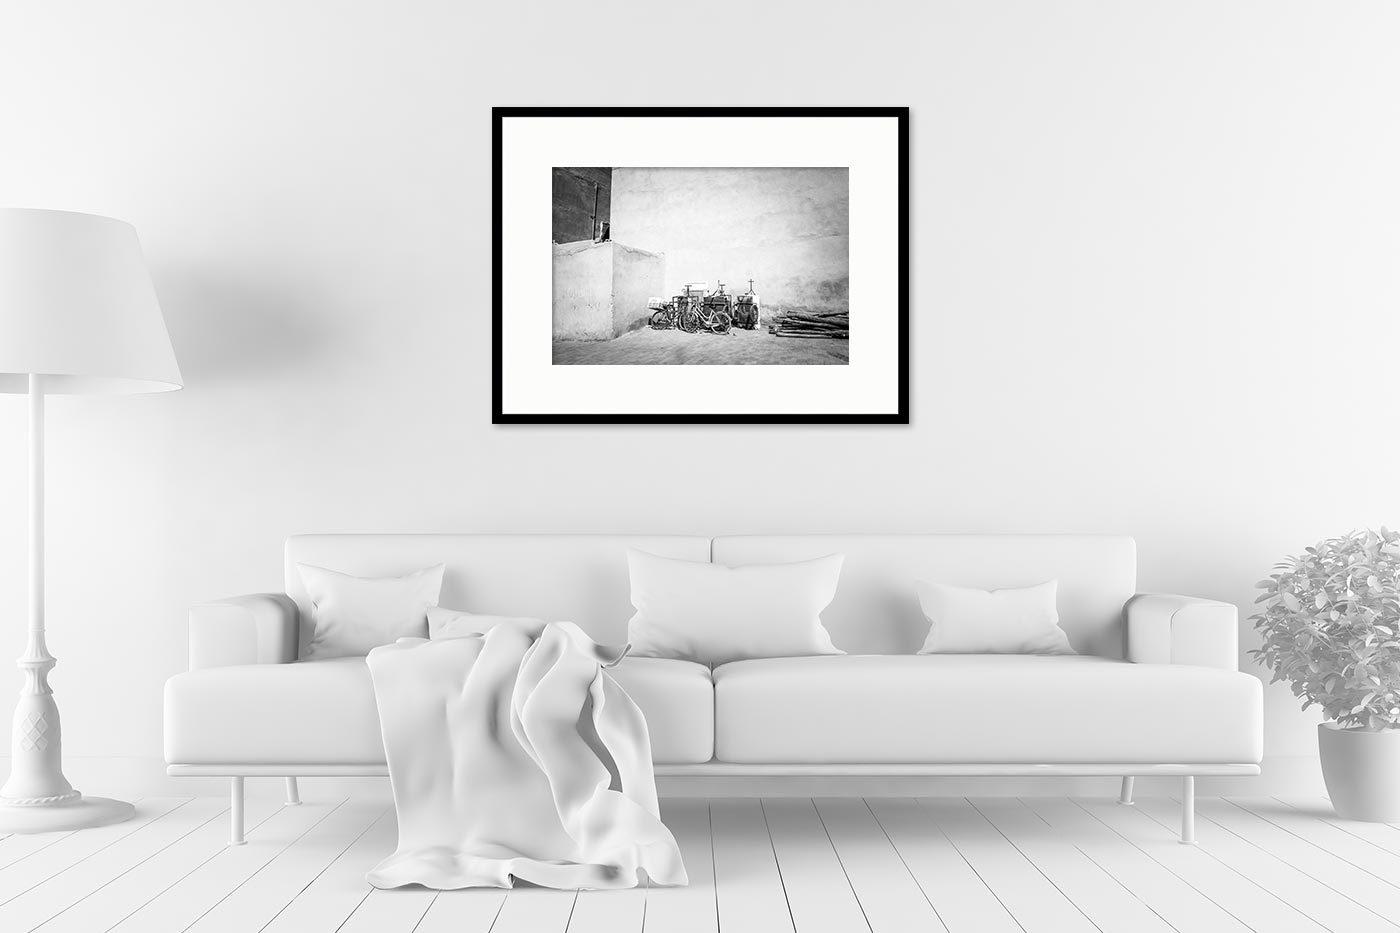 Cadre galerie 60x80 Sleigh